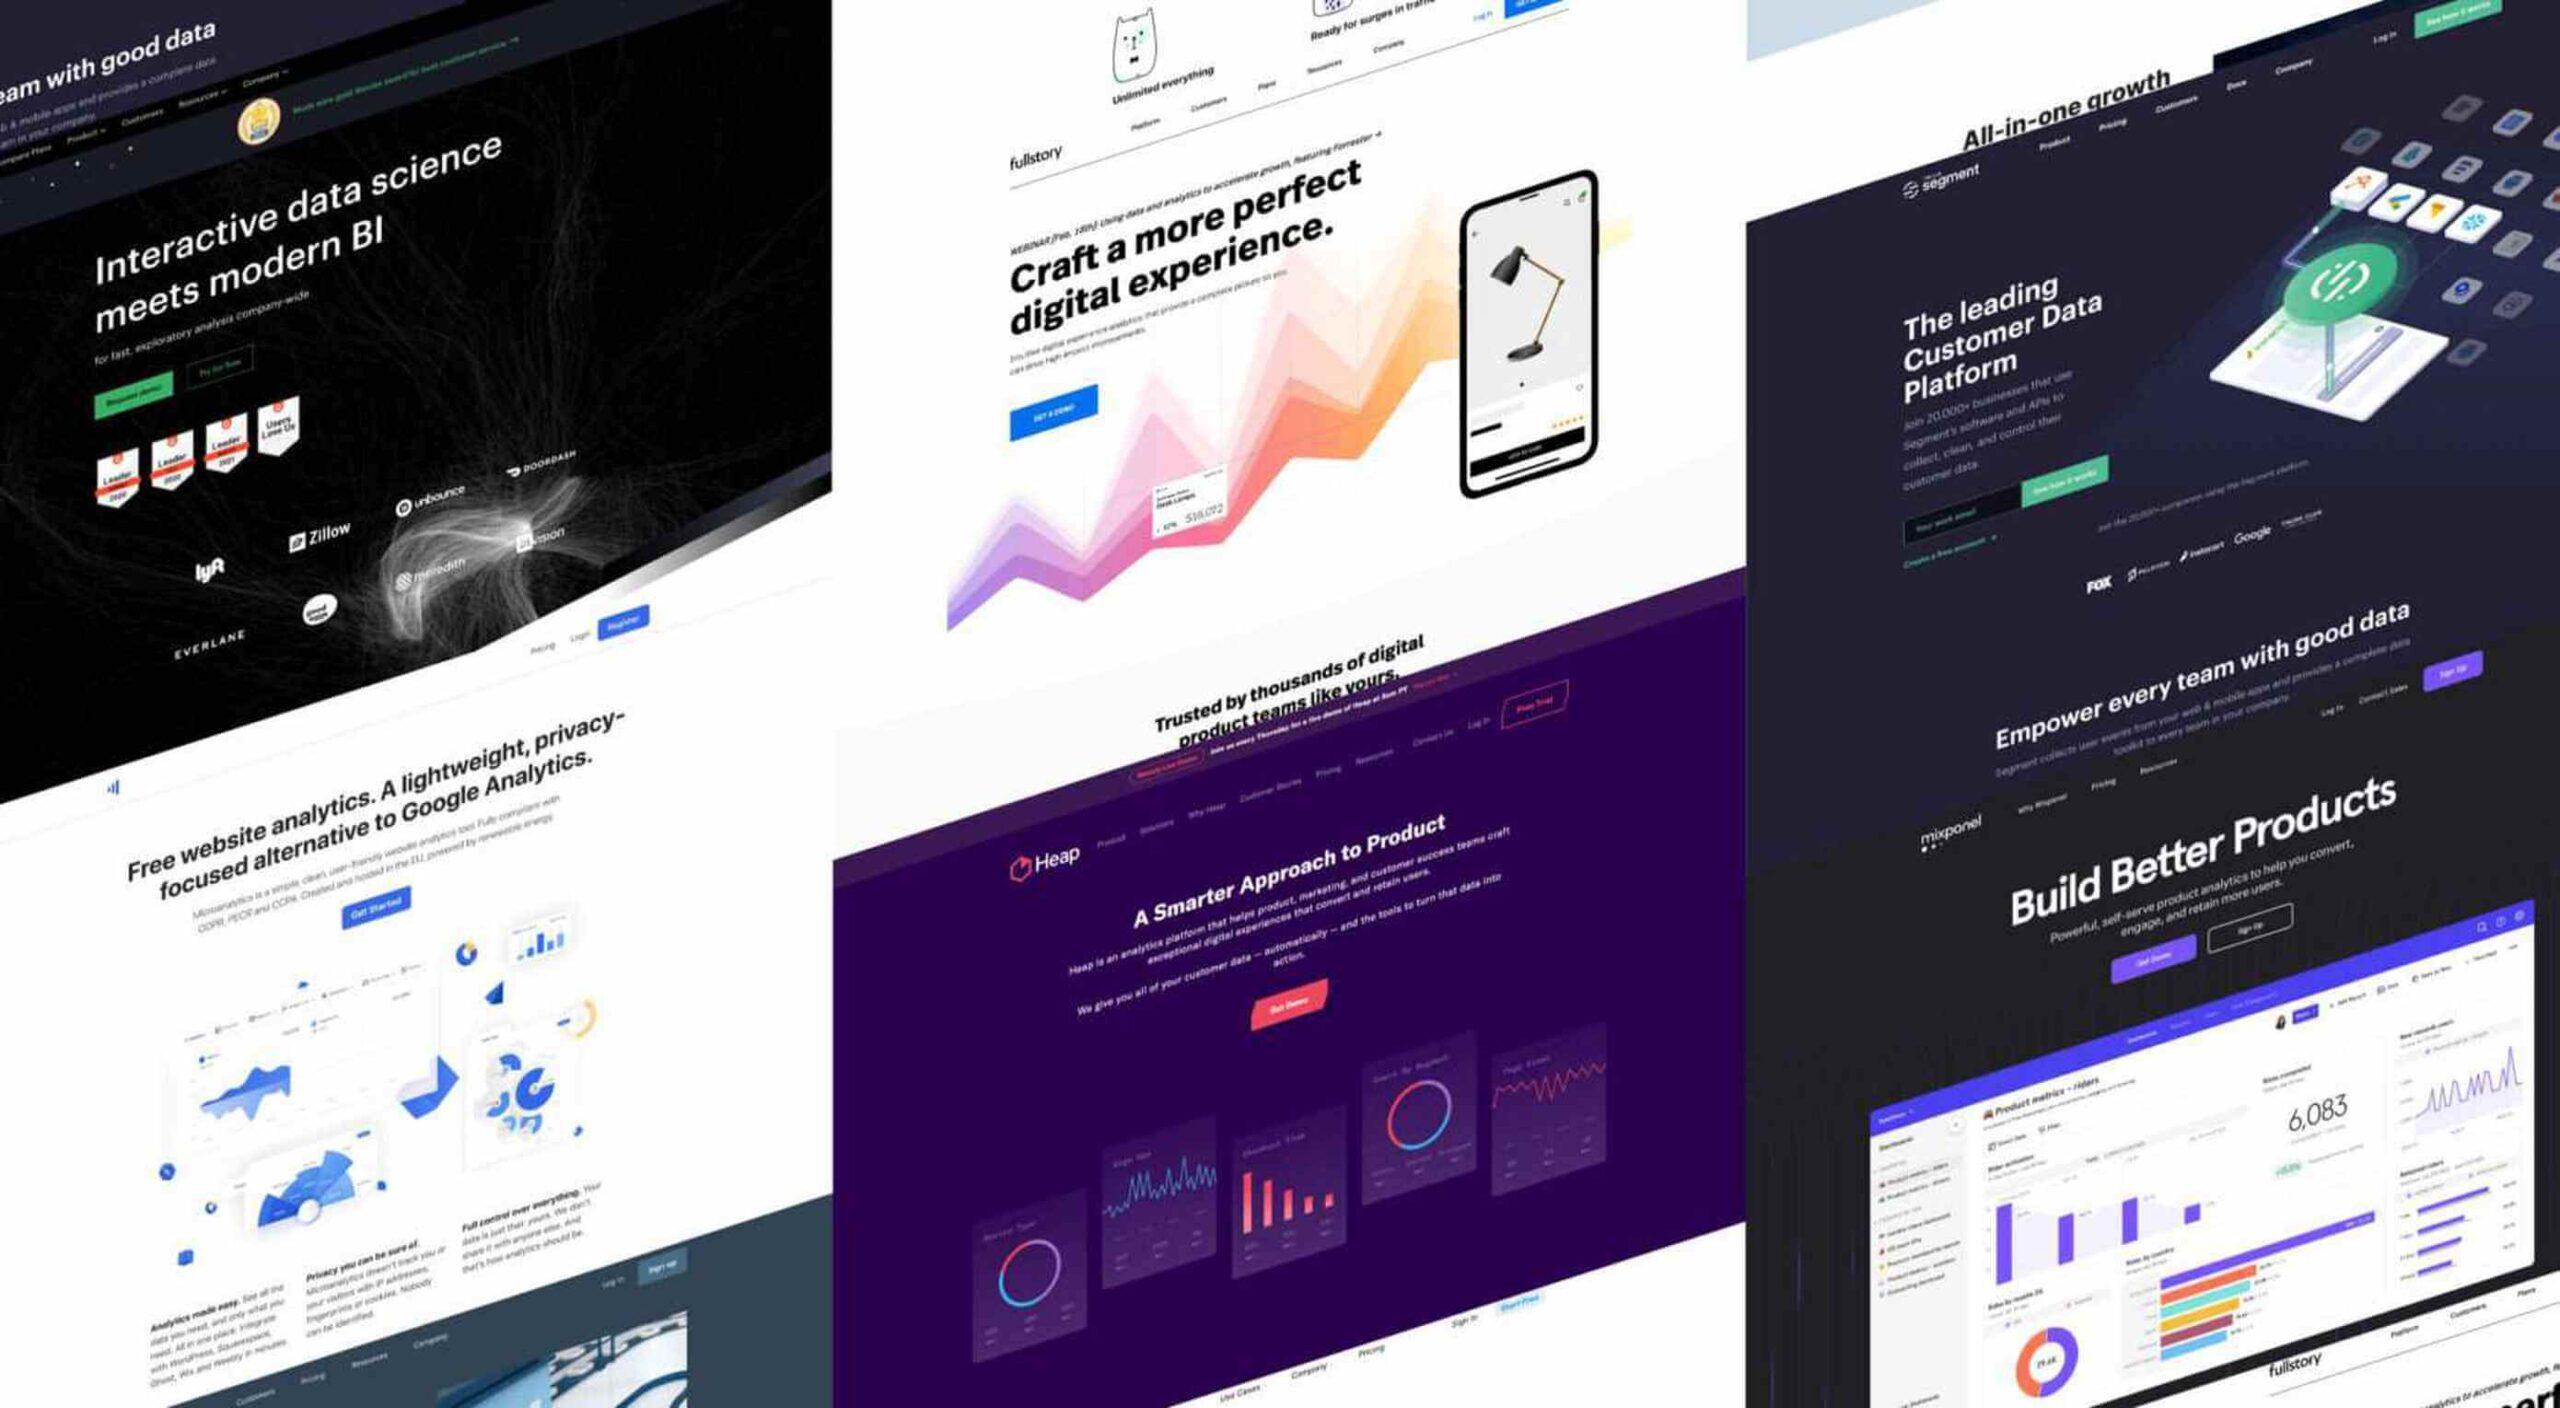 Popular Design News of the Week: February 8, 2021 – February 14, 2021